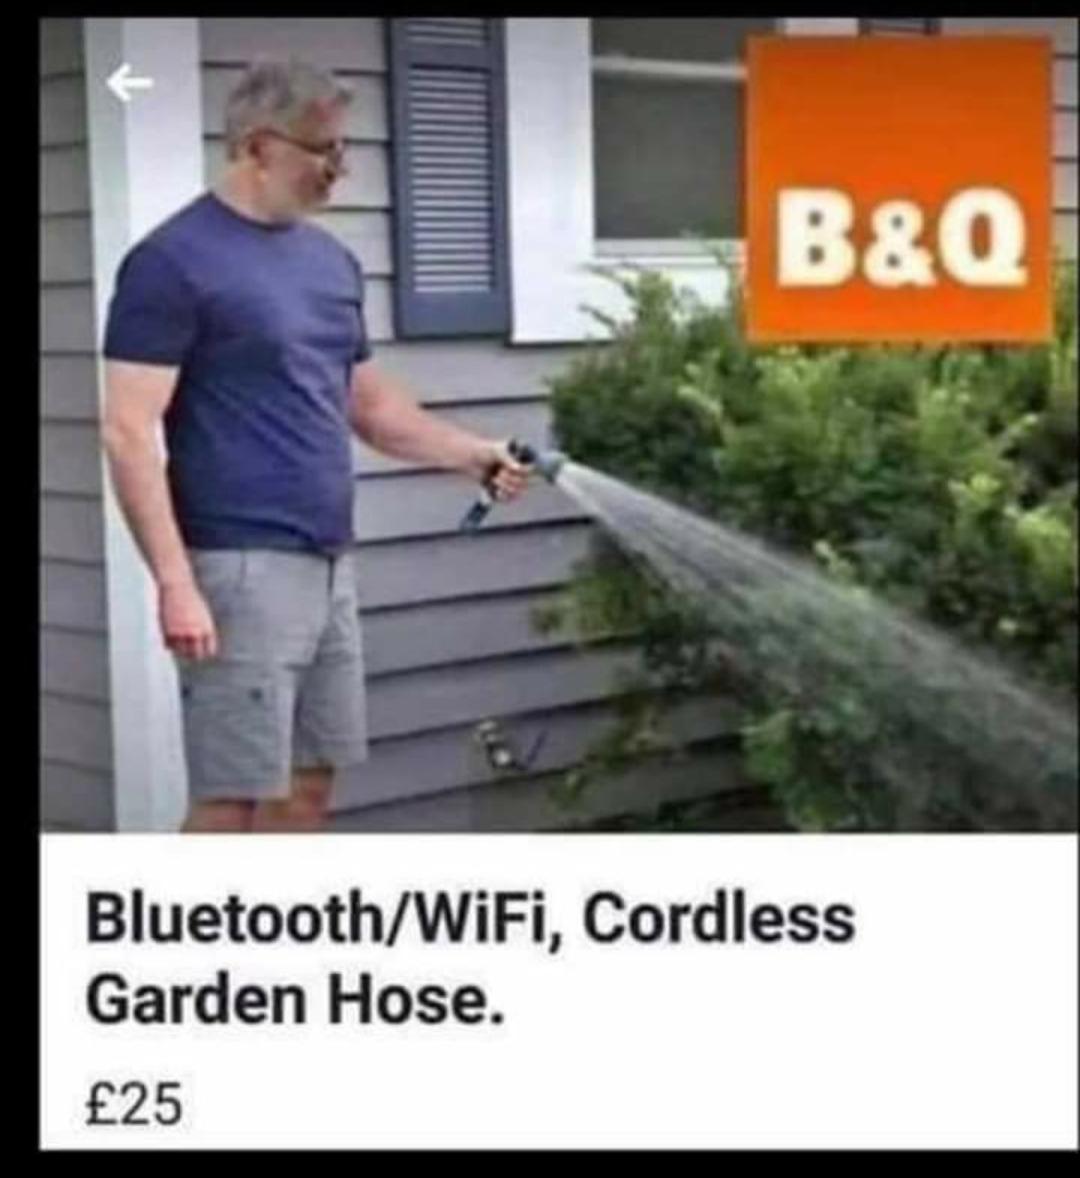 picture of a man using a cordless garden hose. Text reads: Bluetooth/Wifi, cordless garden hose